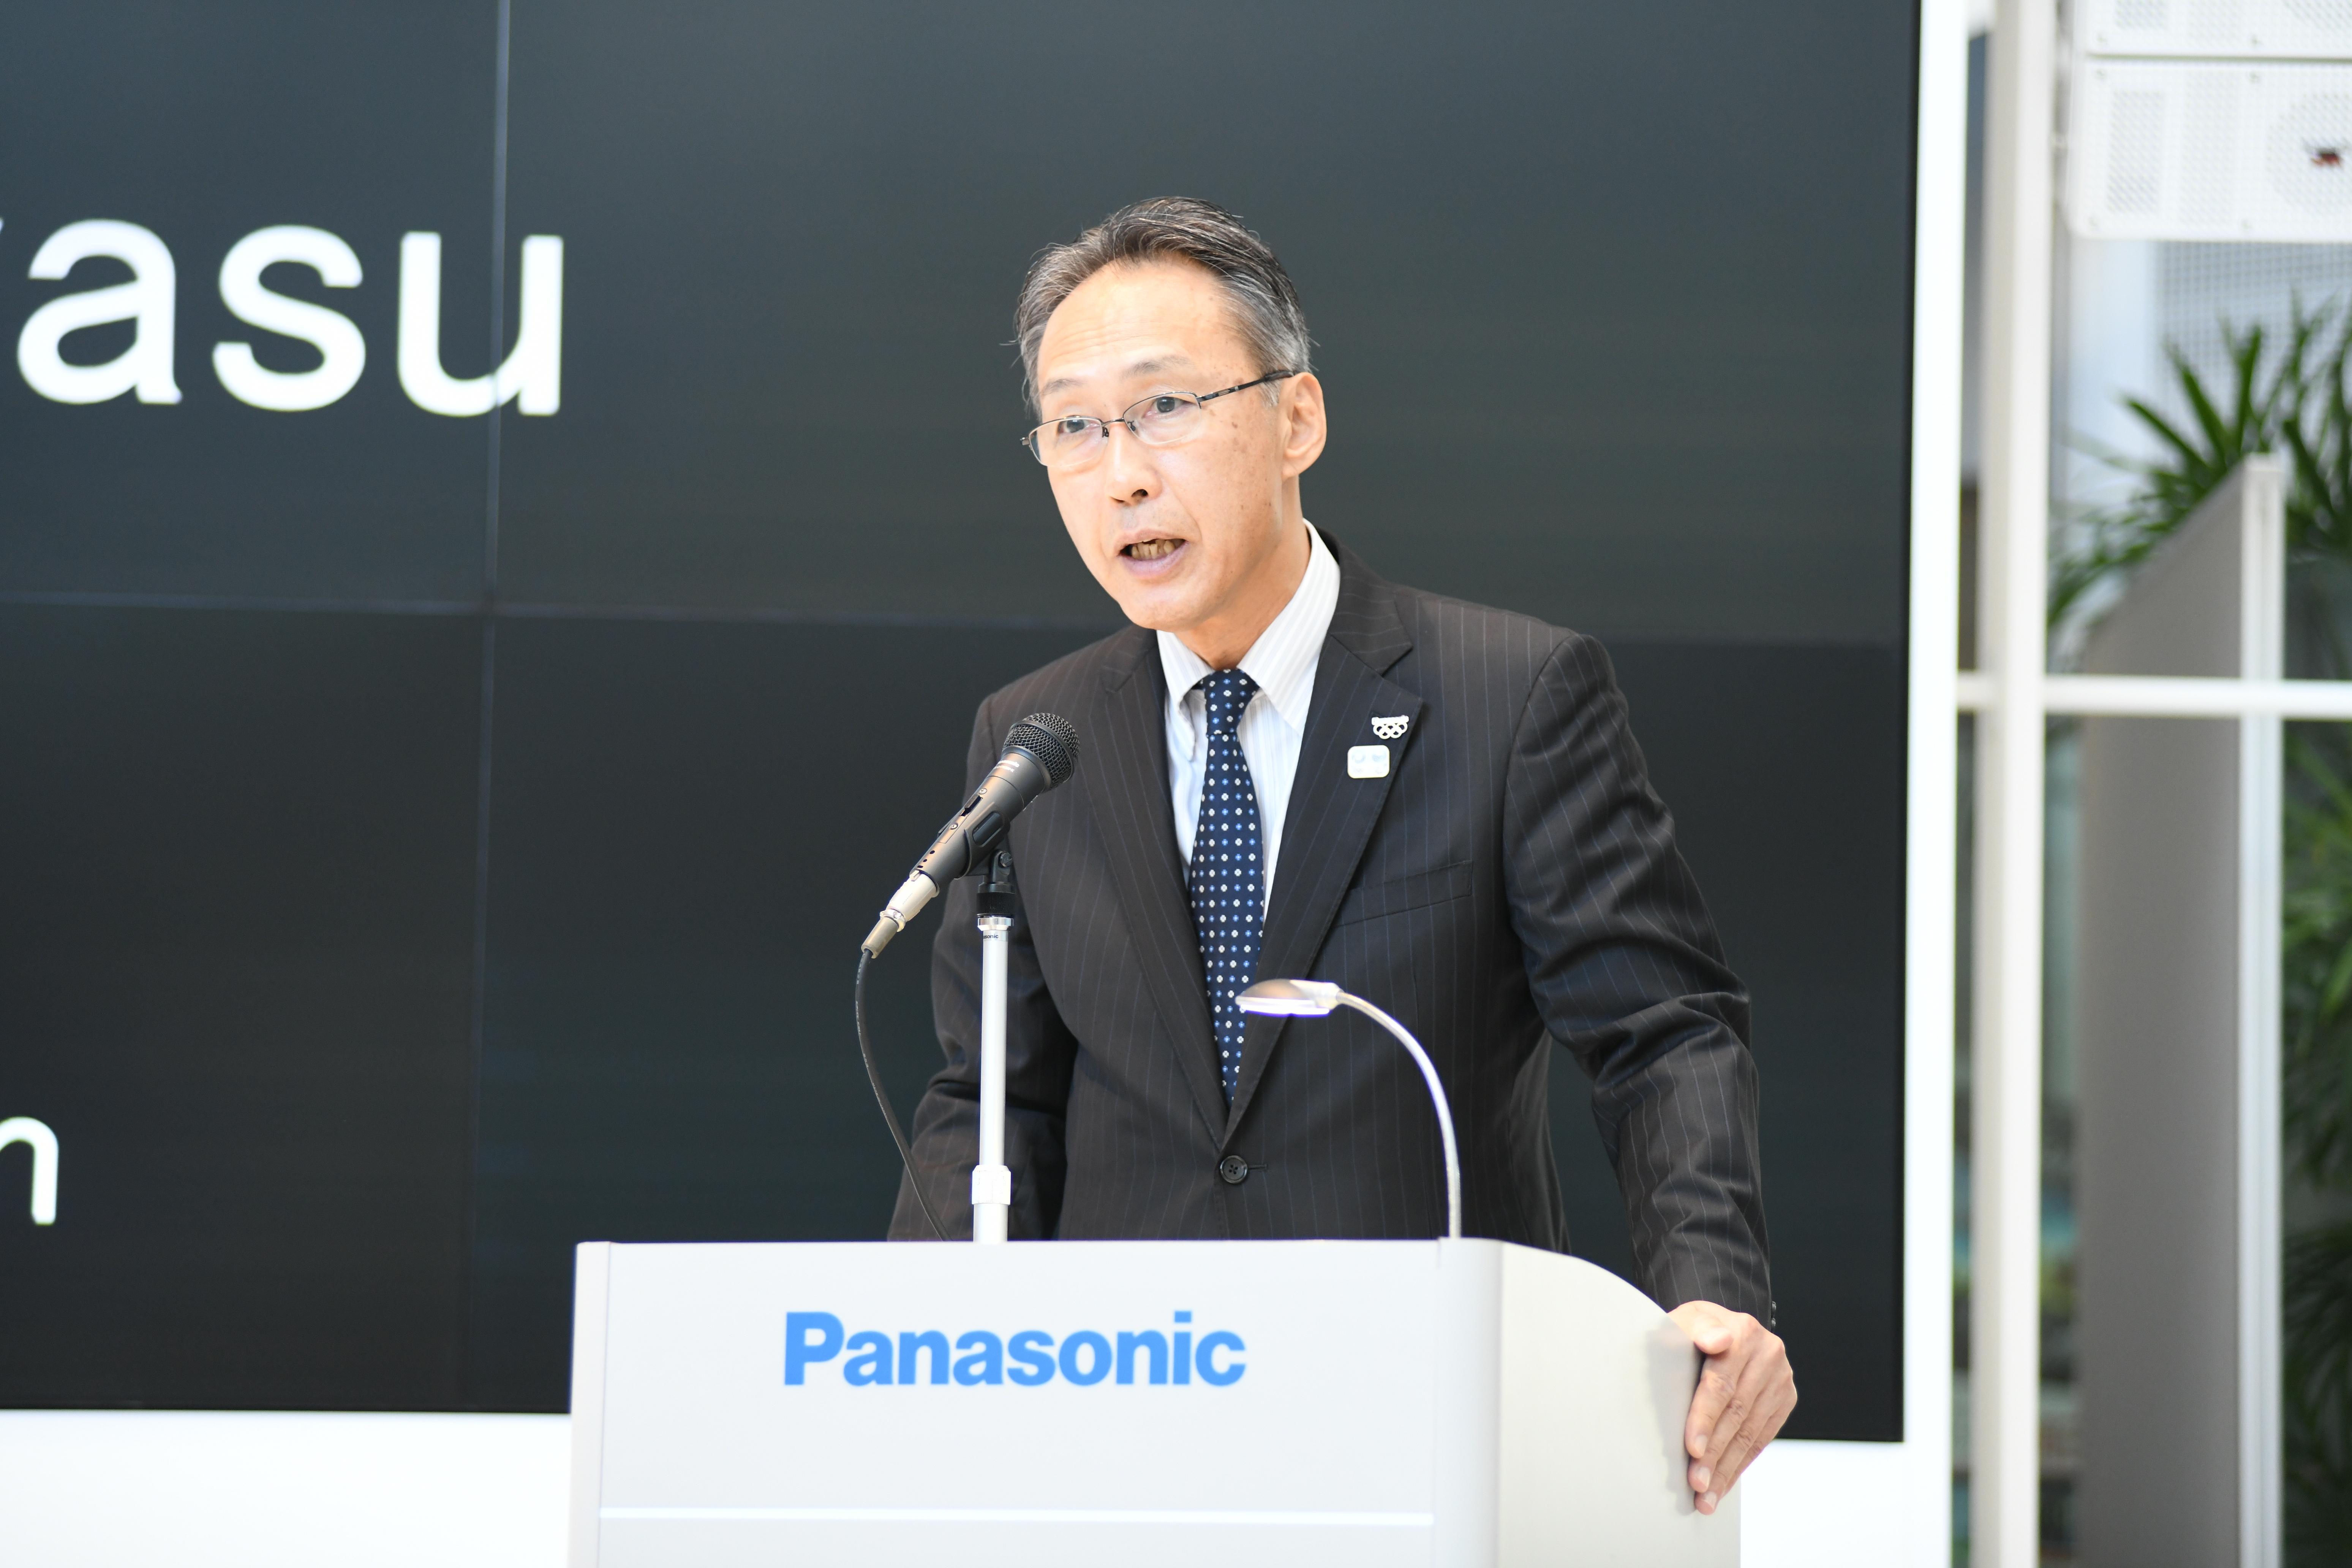 photo: Mr. Satoshi Takeyasu, Executive Officer of Panasonic Cprporation